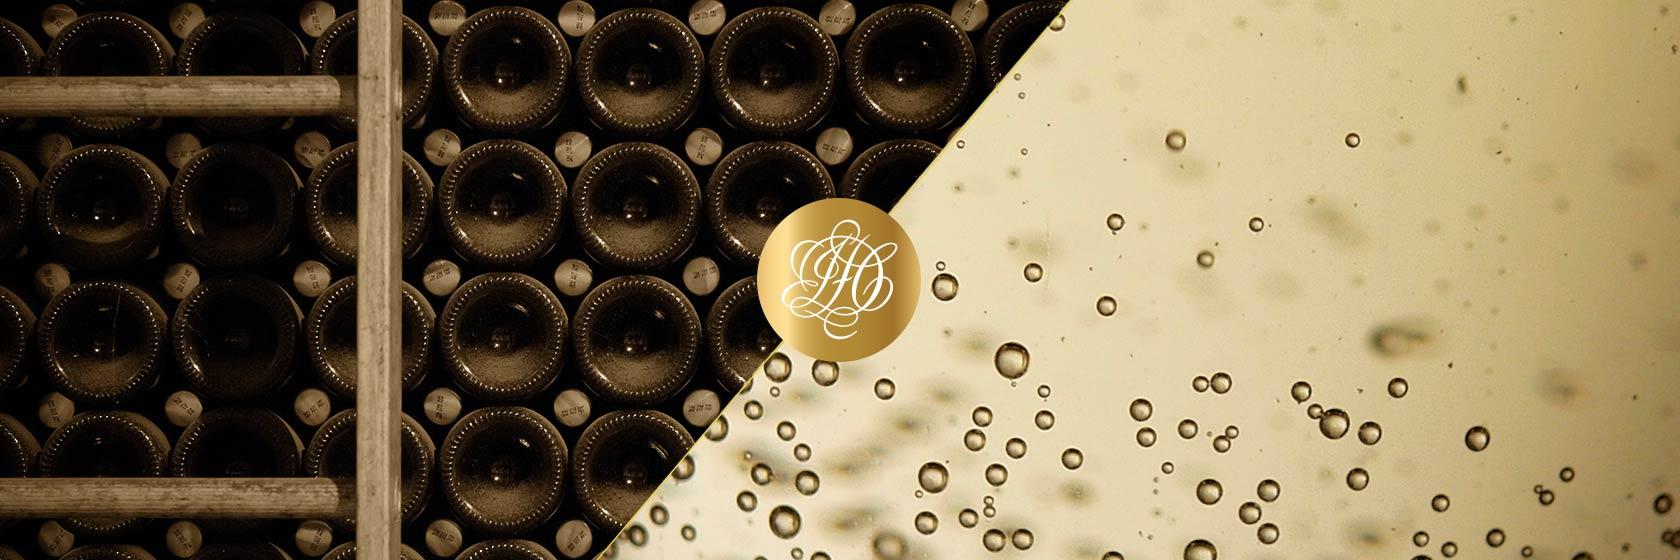 femme chalons en champagne